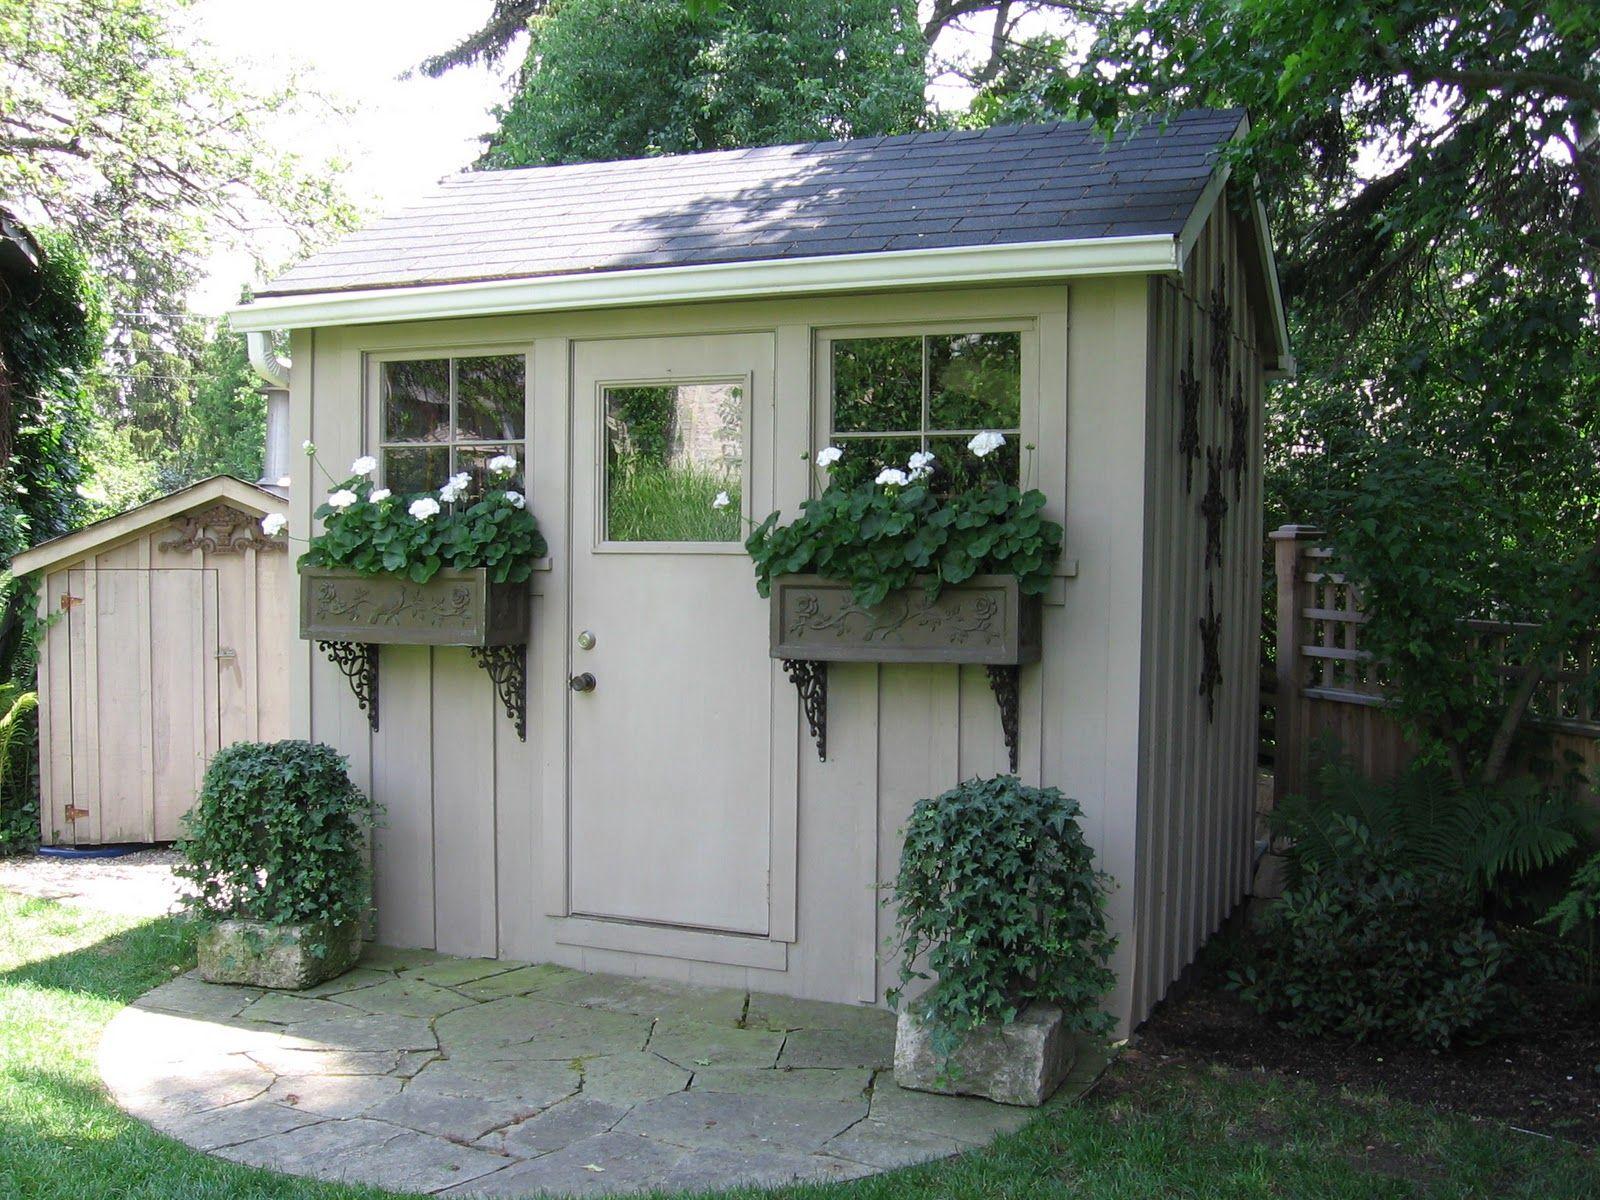 Shed Plans Vipattractive Garden Sheds Saltbox Shed Plans